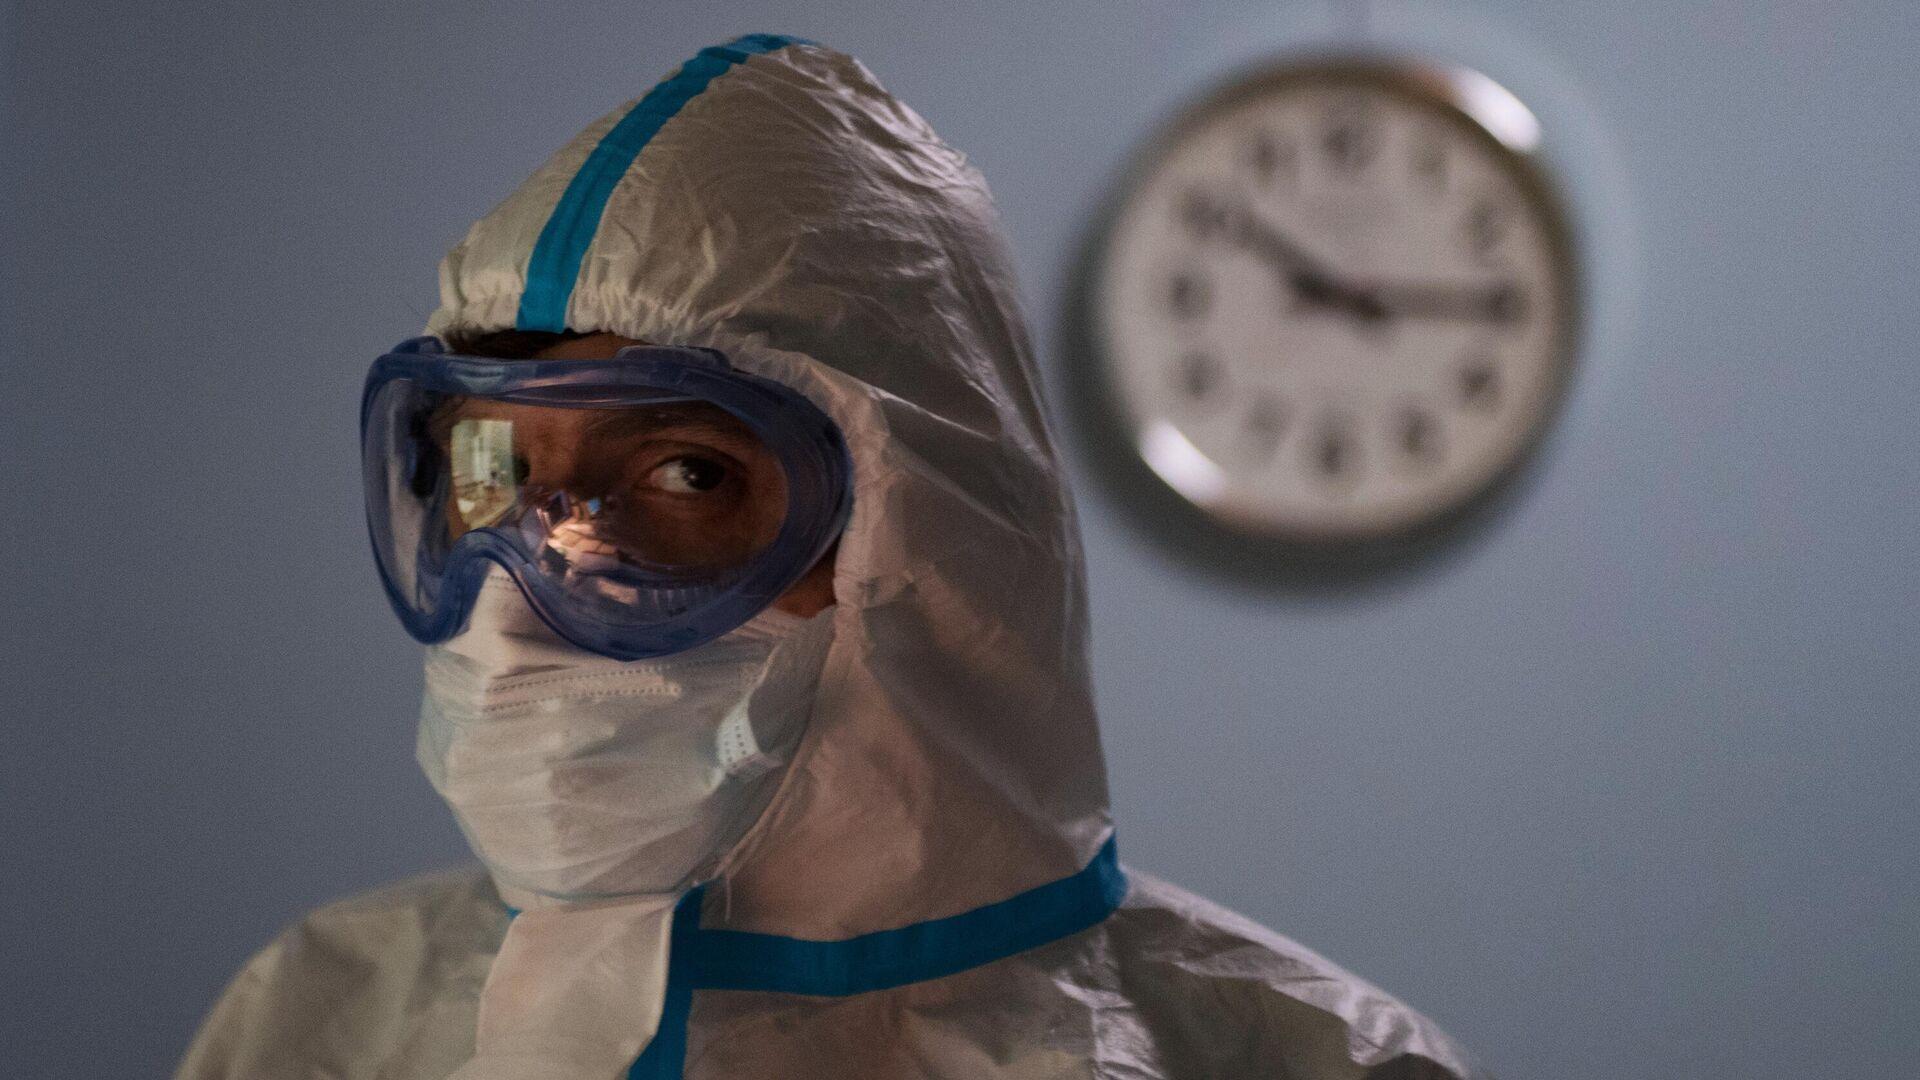 Un médico ruso que atiende casos de coronavirus en un hospital de Rusia - Sputnik Mundo, 1920, 22.09.2021